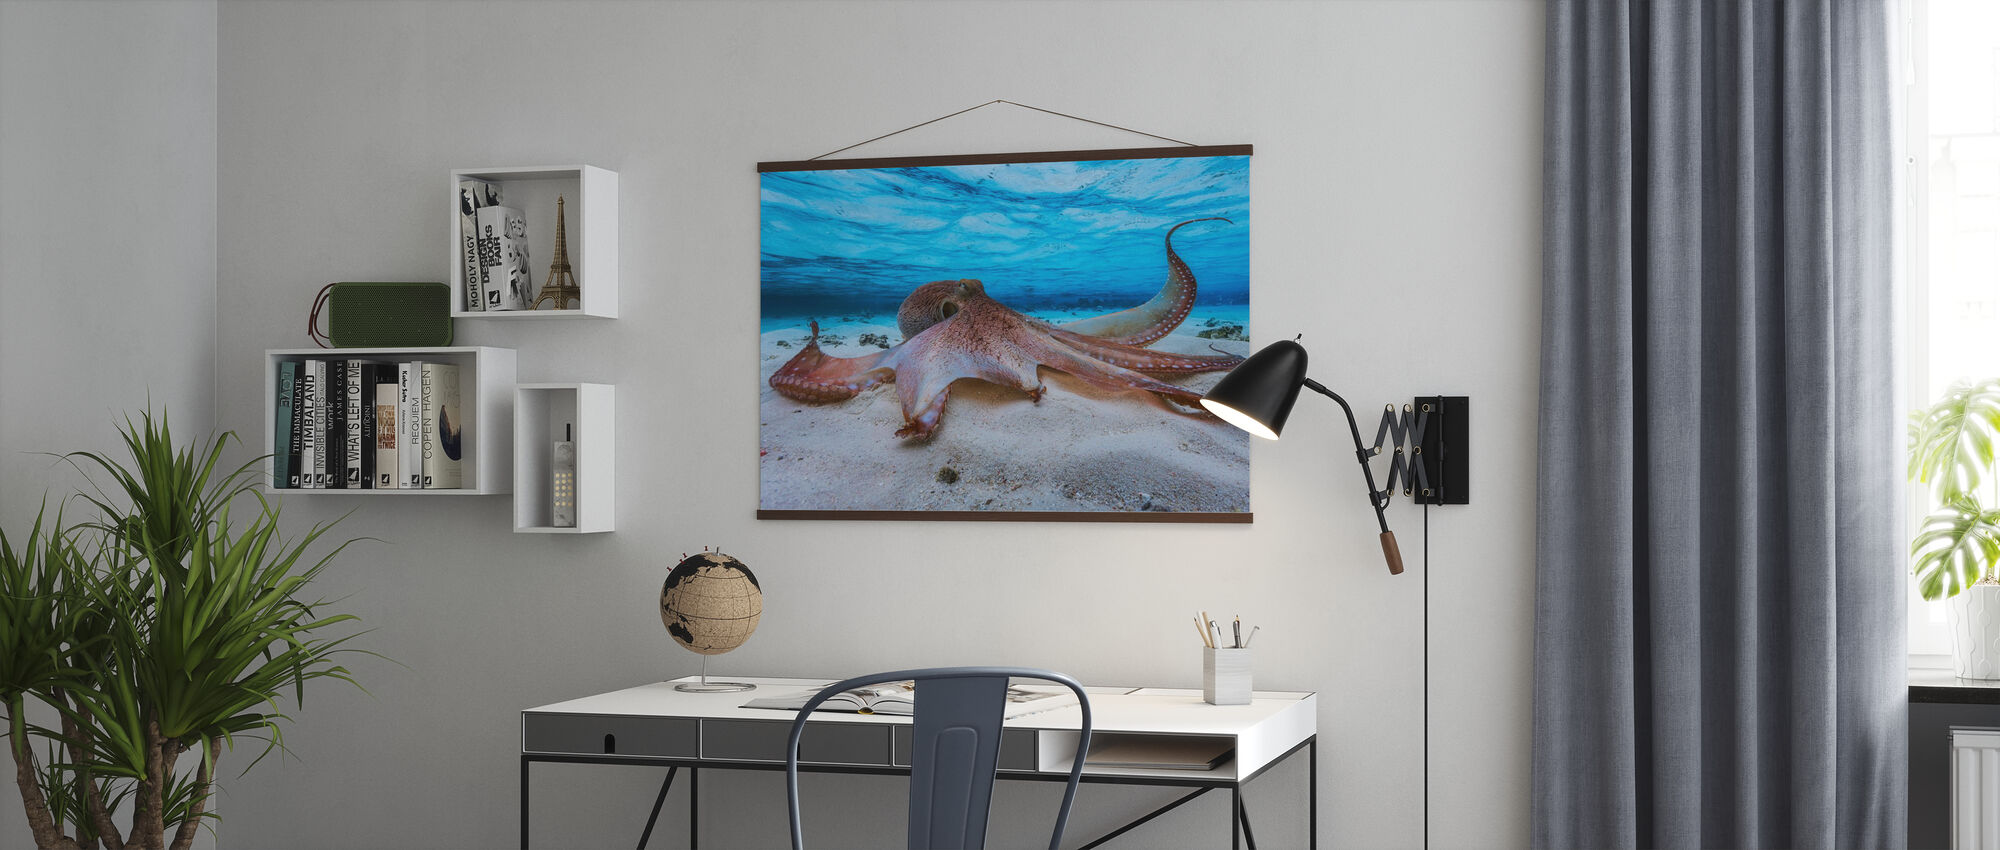 Blekksprut - Plakat - Kontor